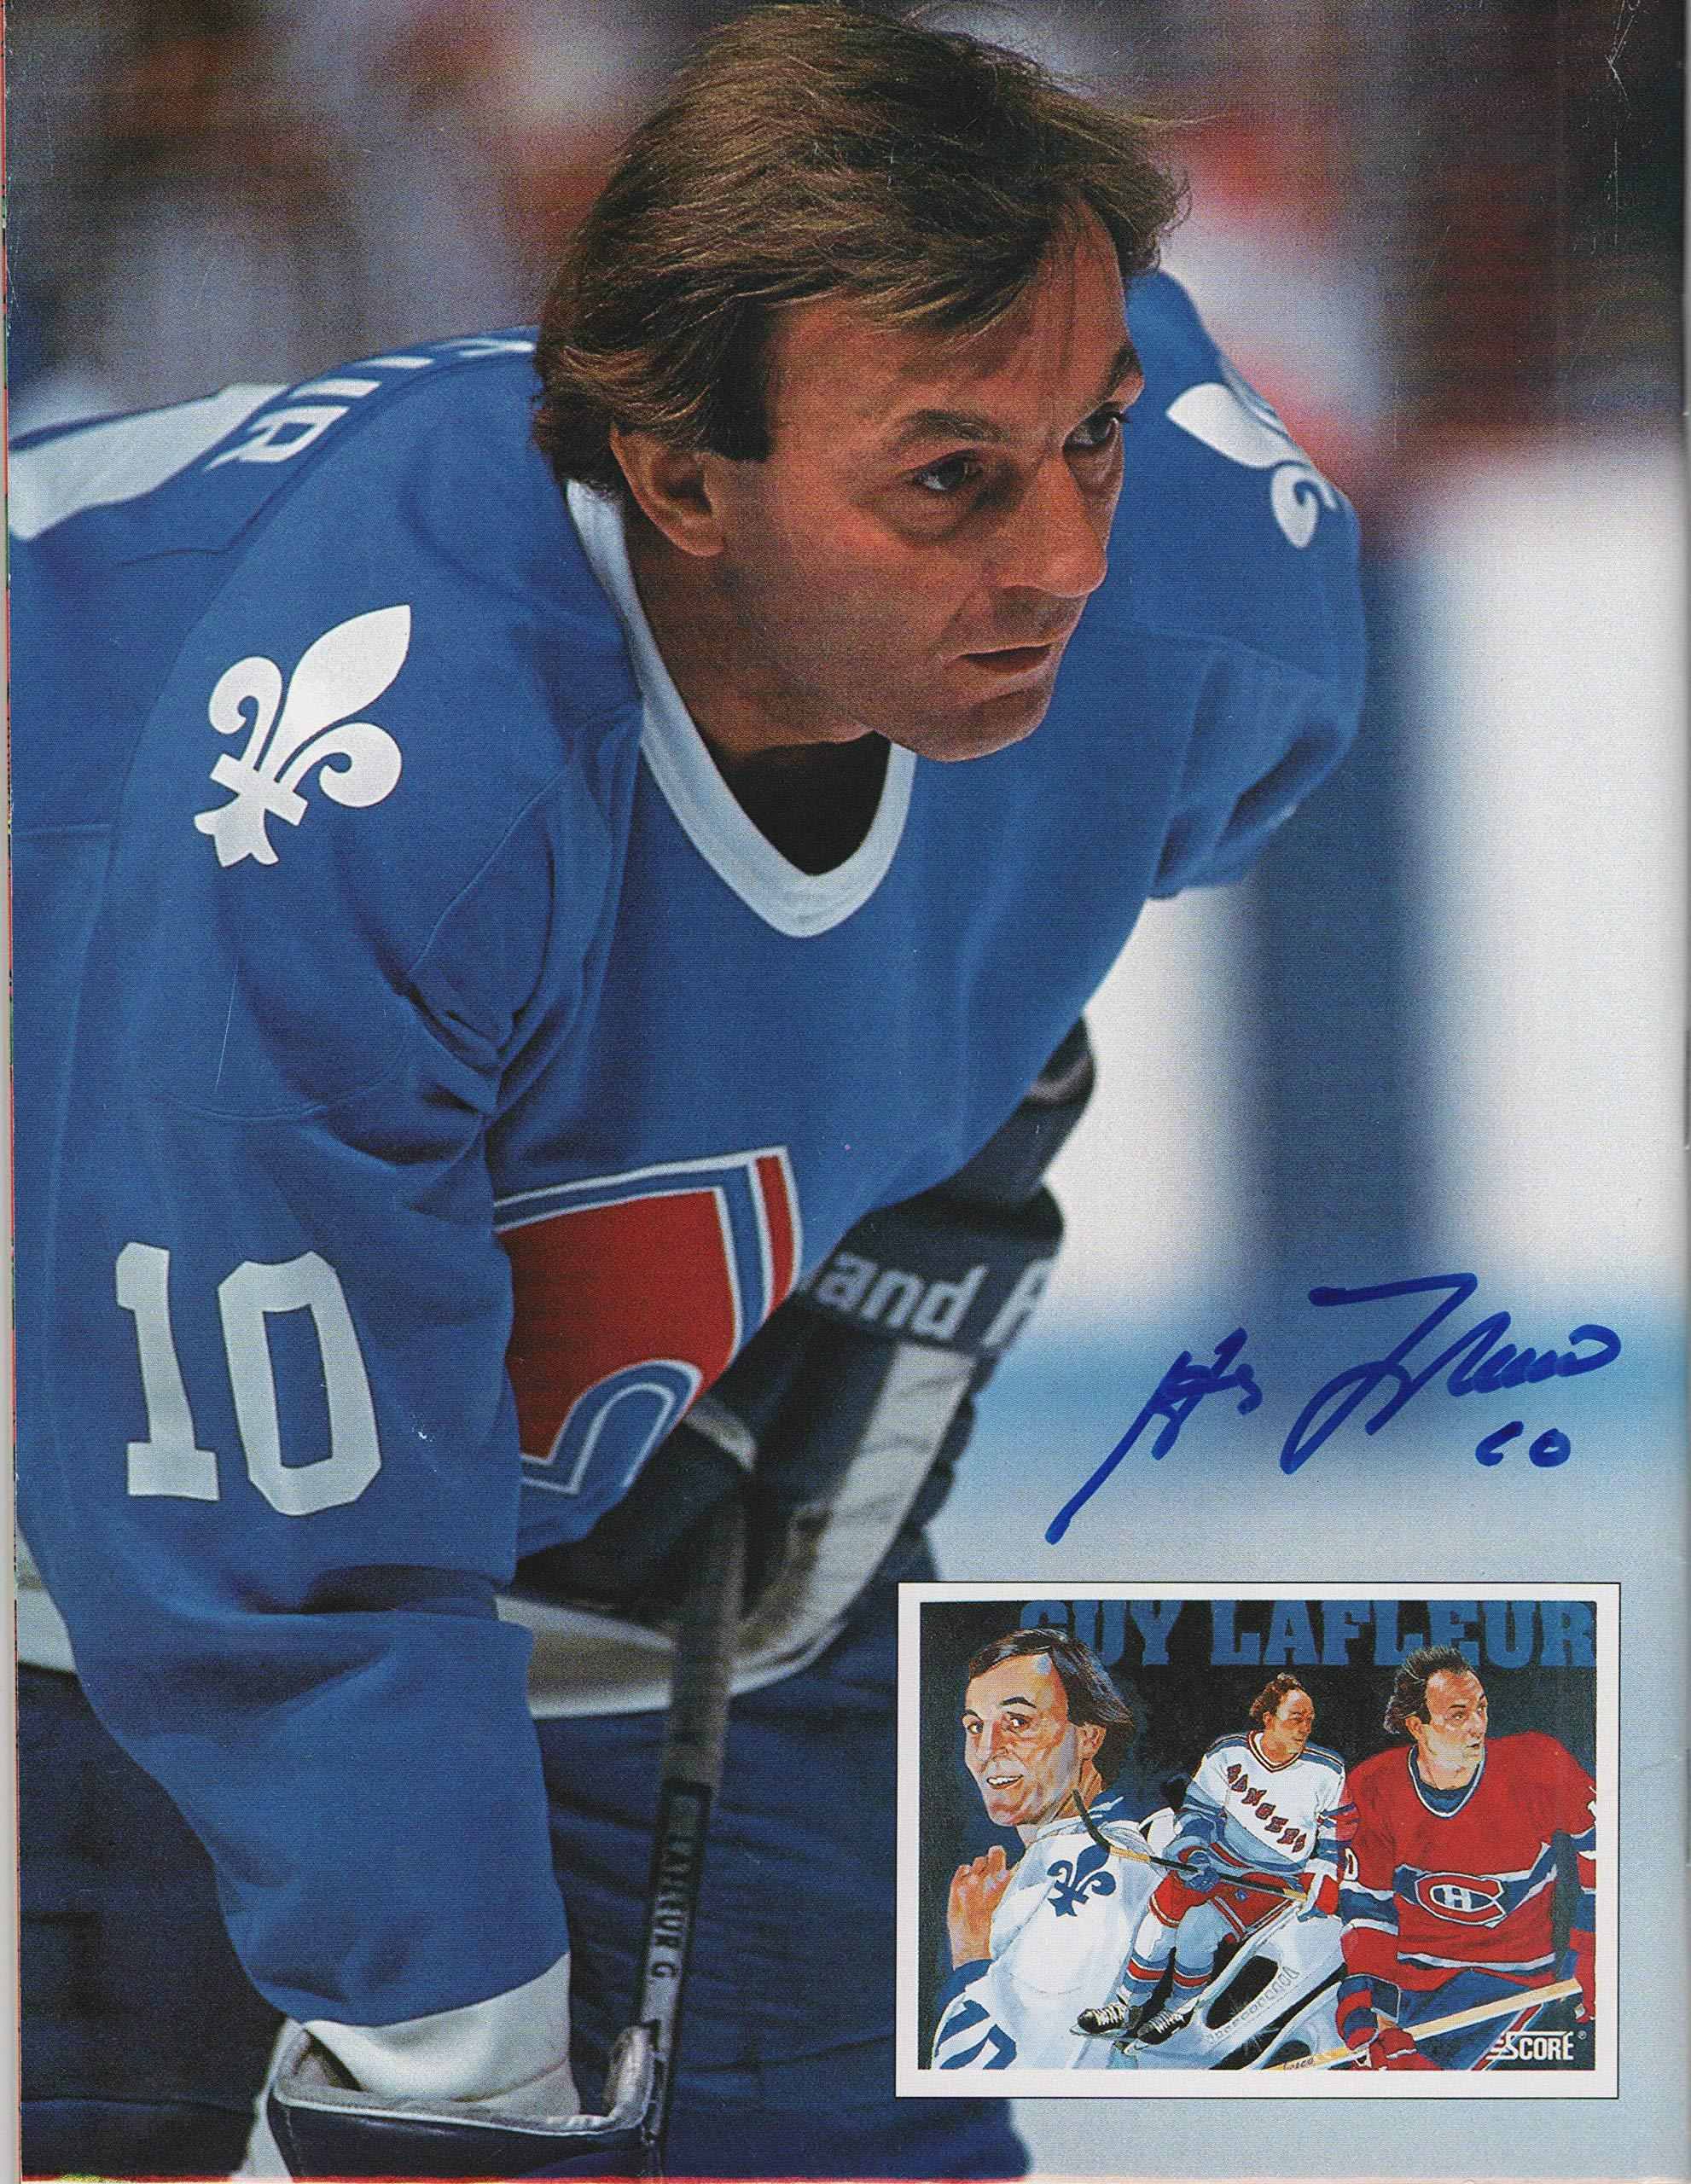 Guy Lafleur Hand Signed 8 x 11 Beckett Hockey Monthly Magazine Signed on Back Cover in Blue Felt Pen